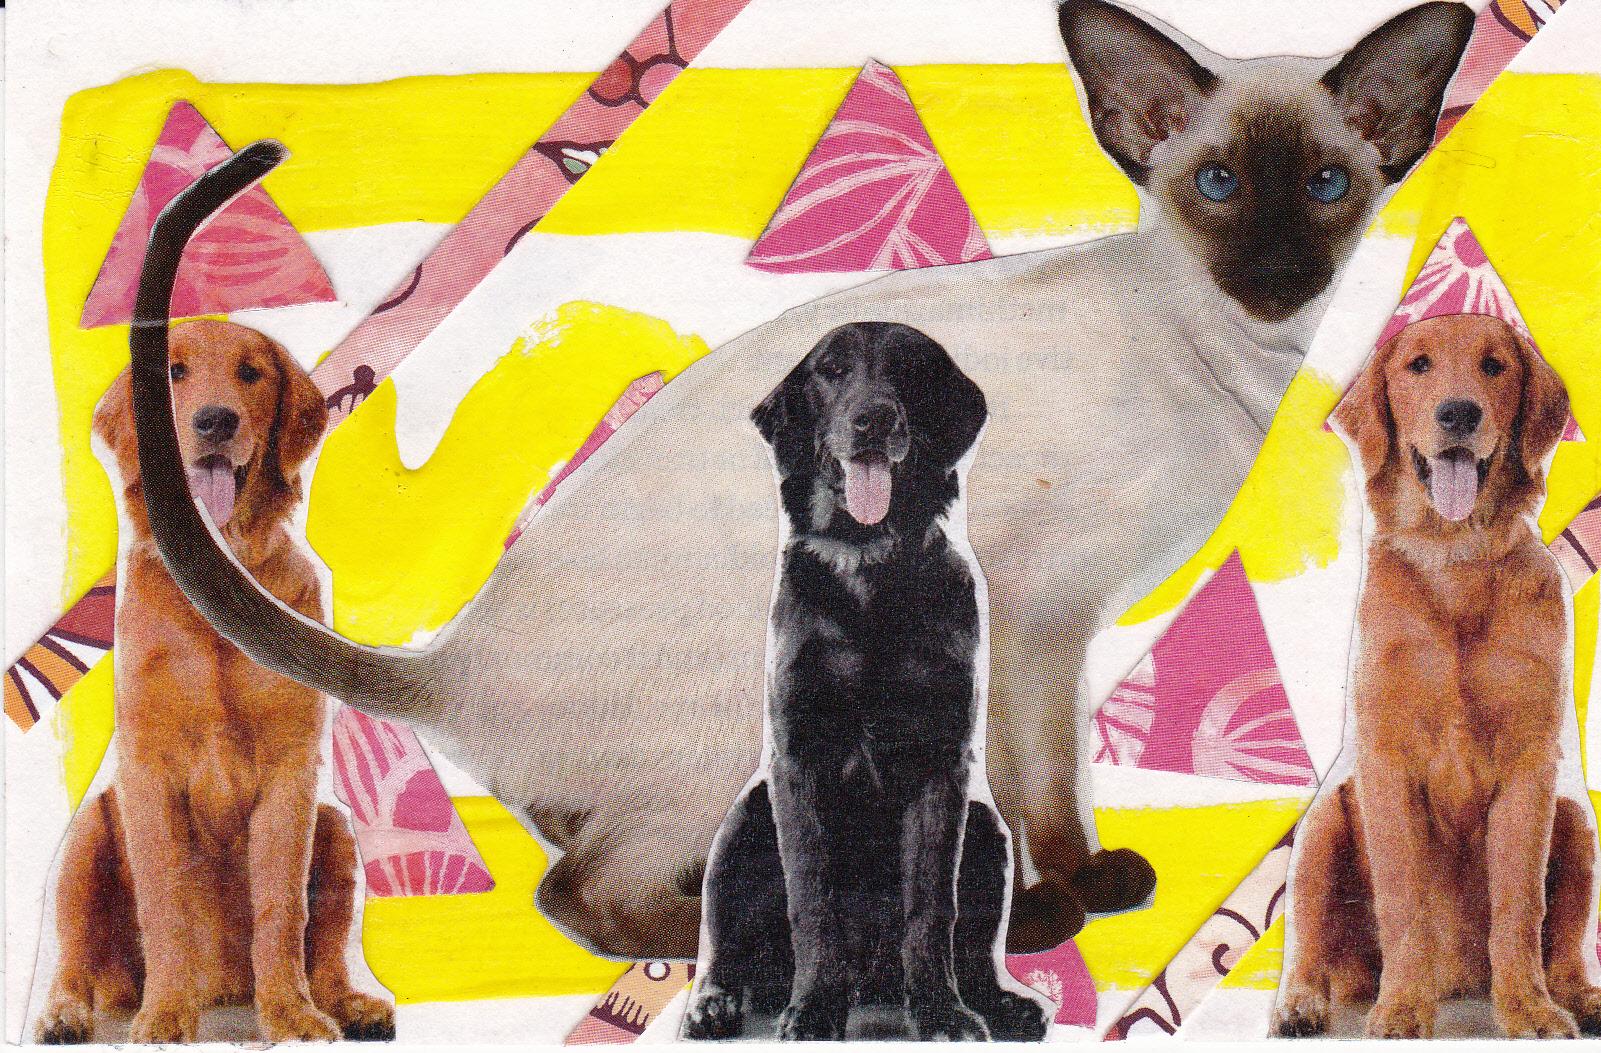 yellow 3 dogs 1 cat